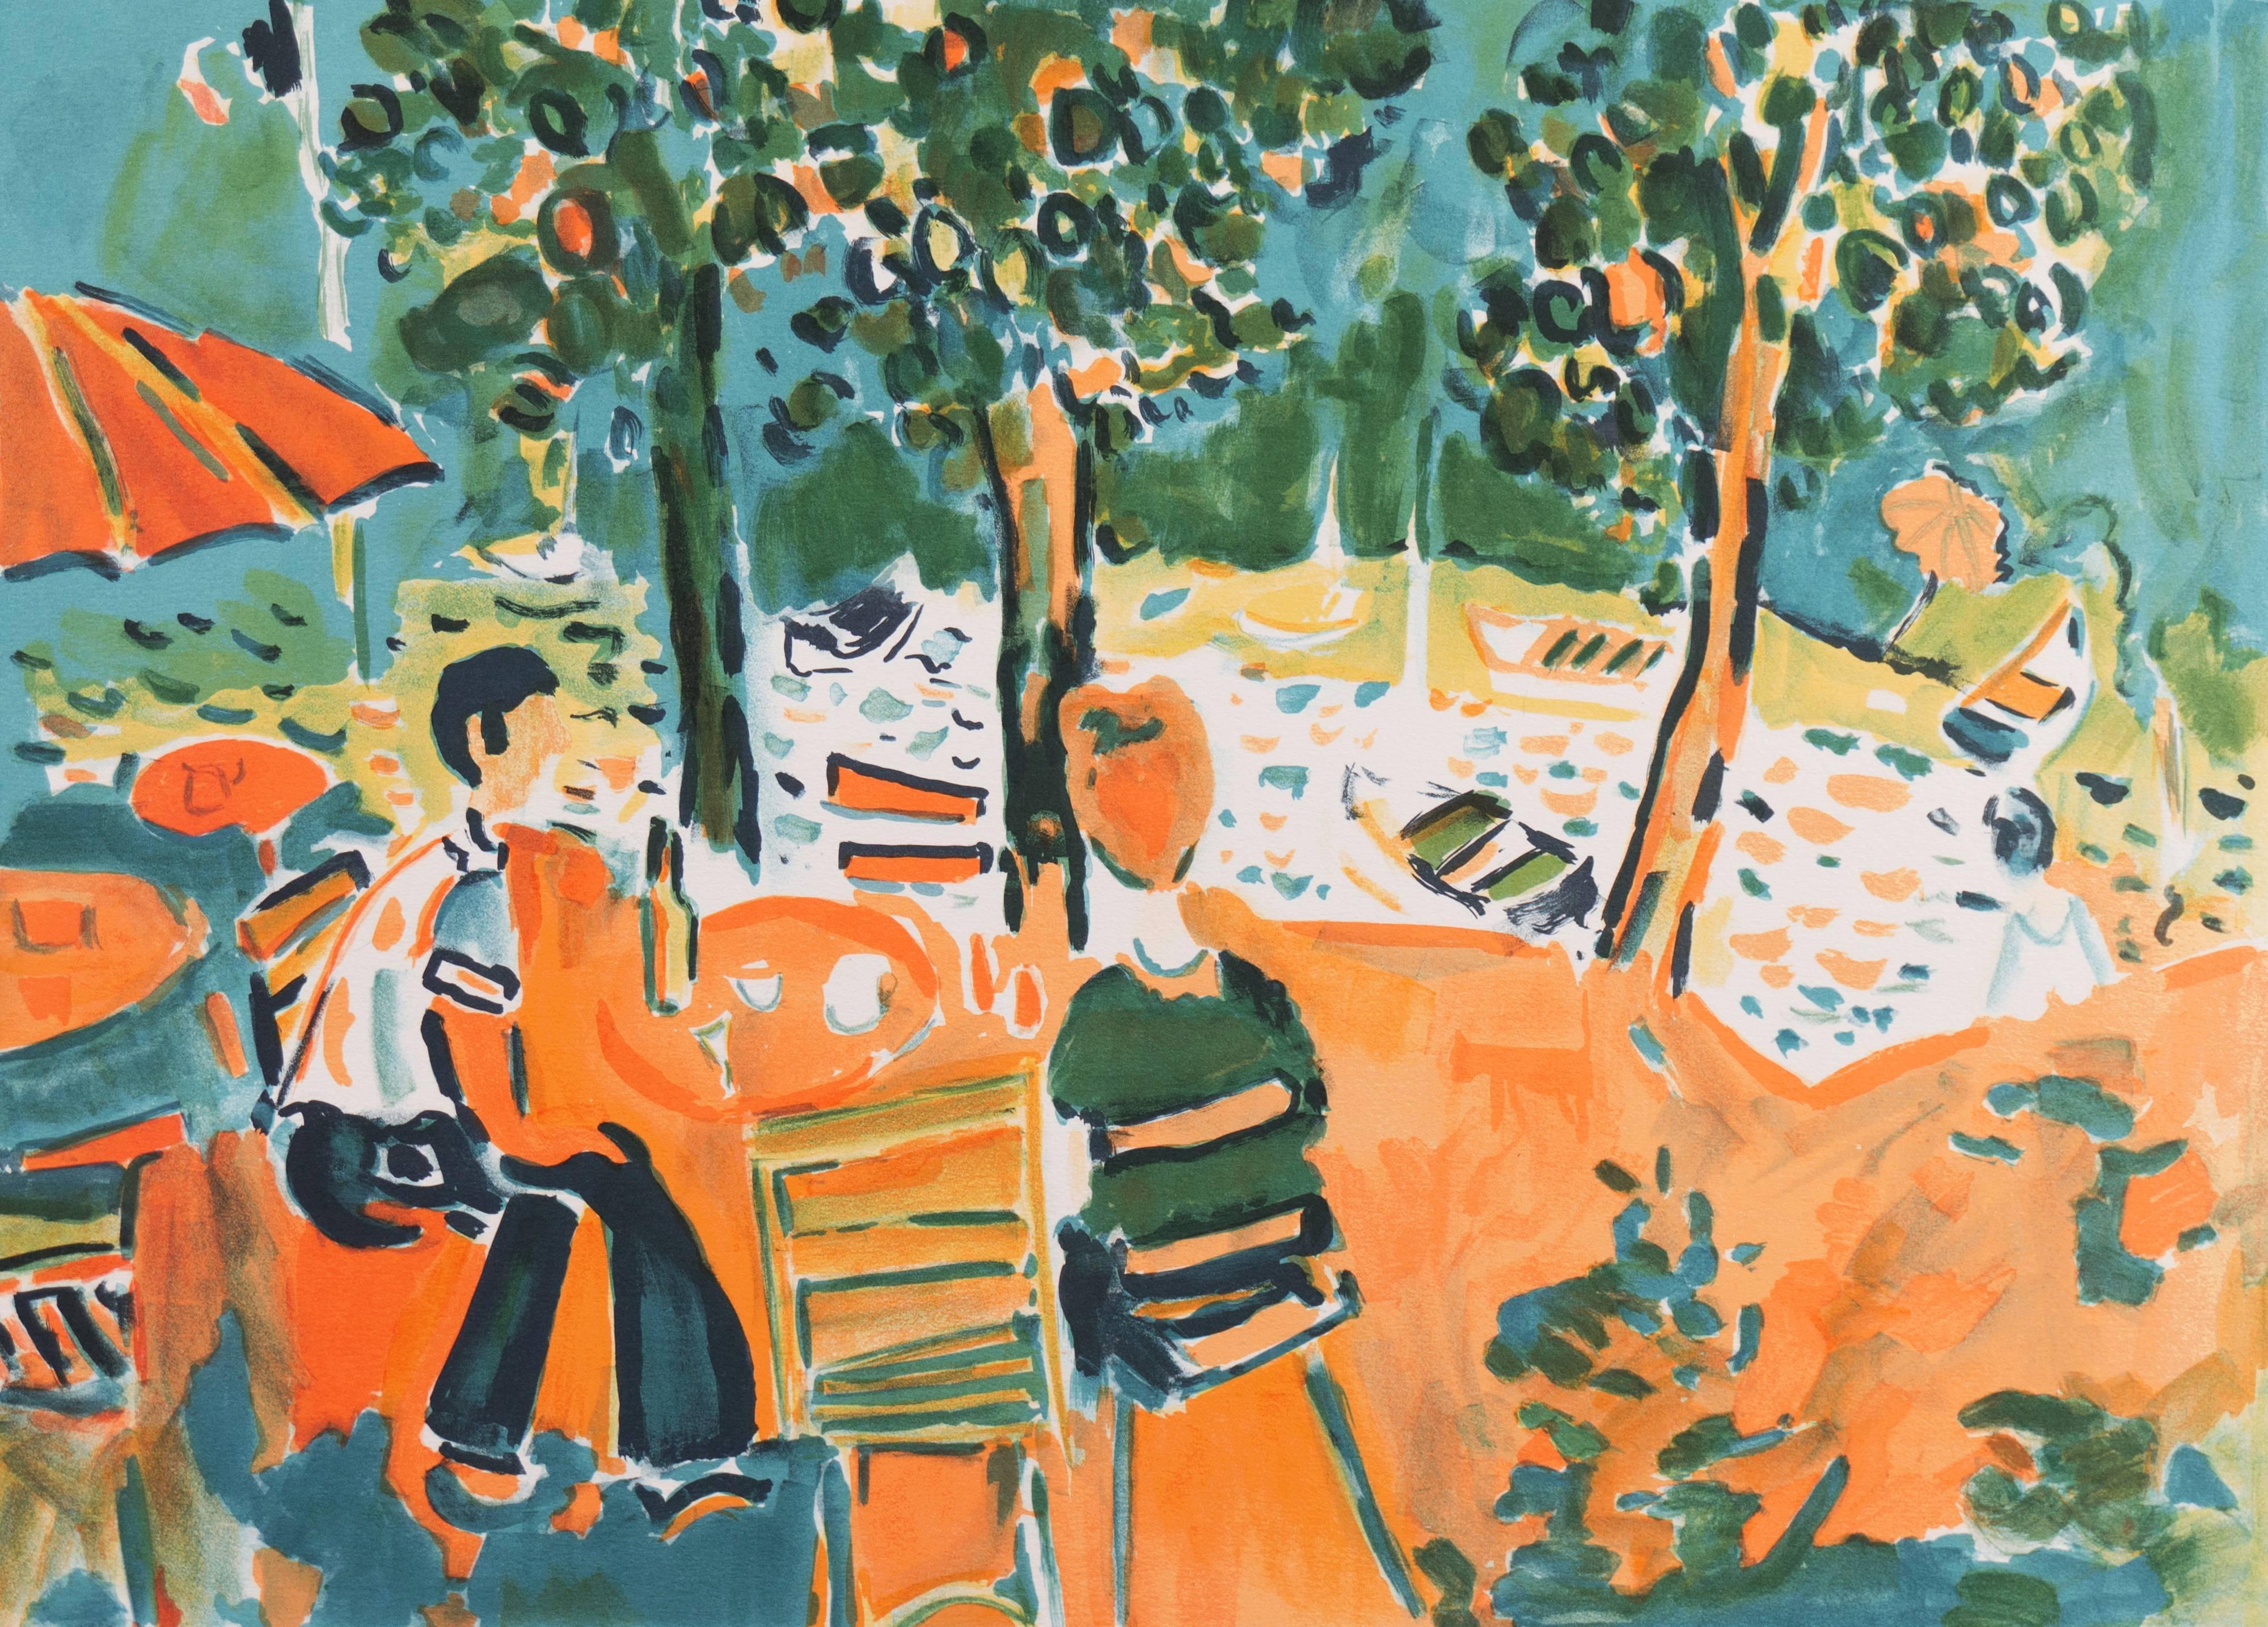 'River Landscape', Academy of Fine Arts in Rouen